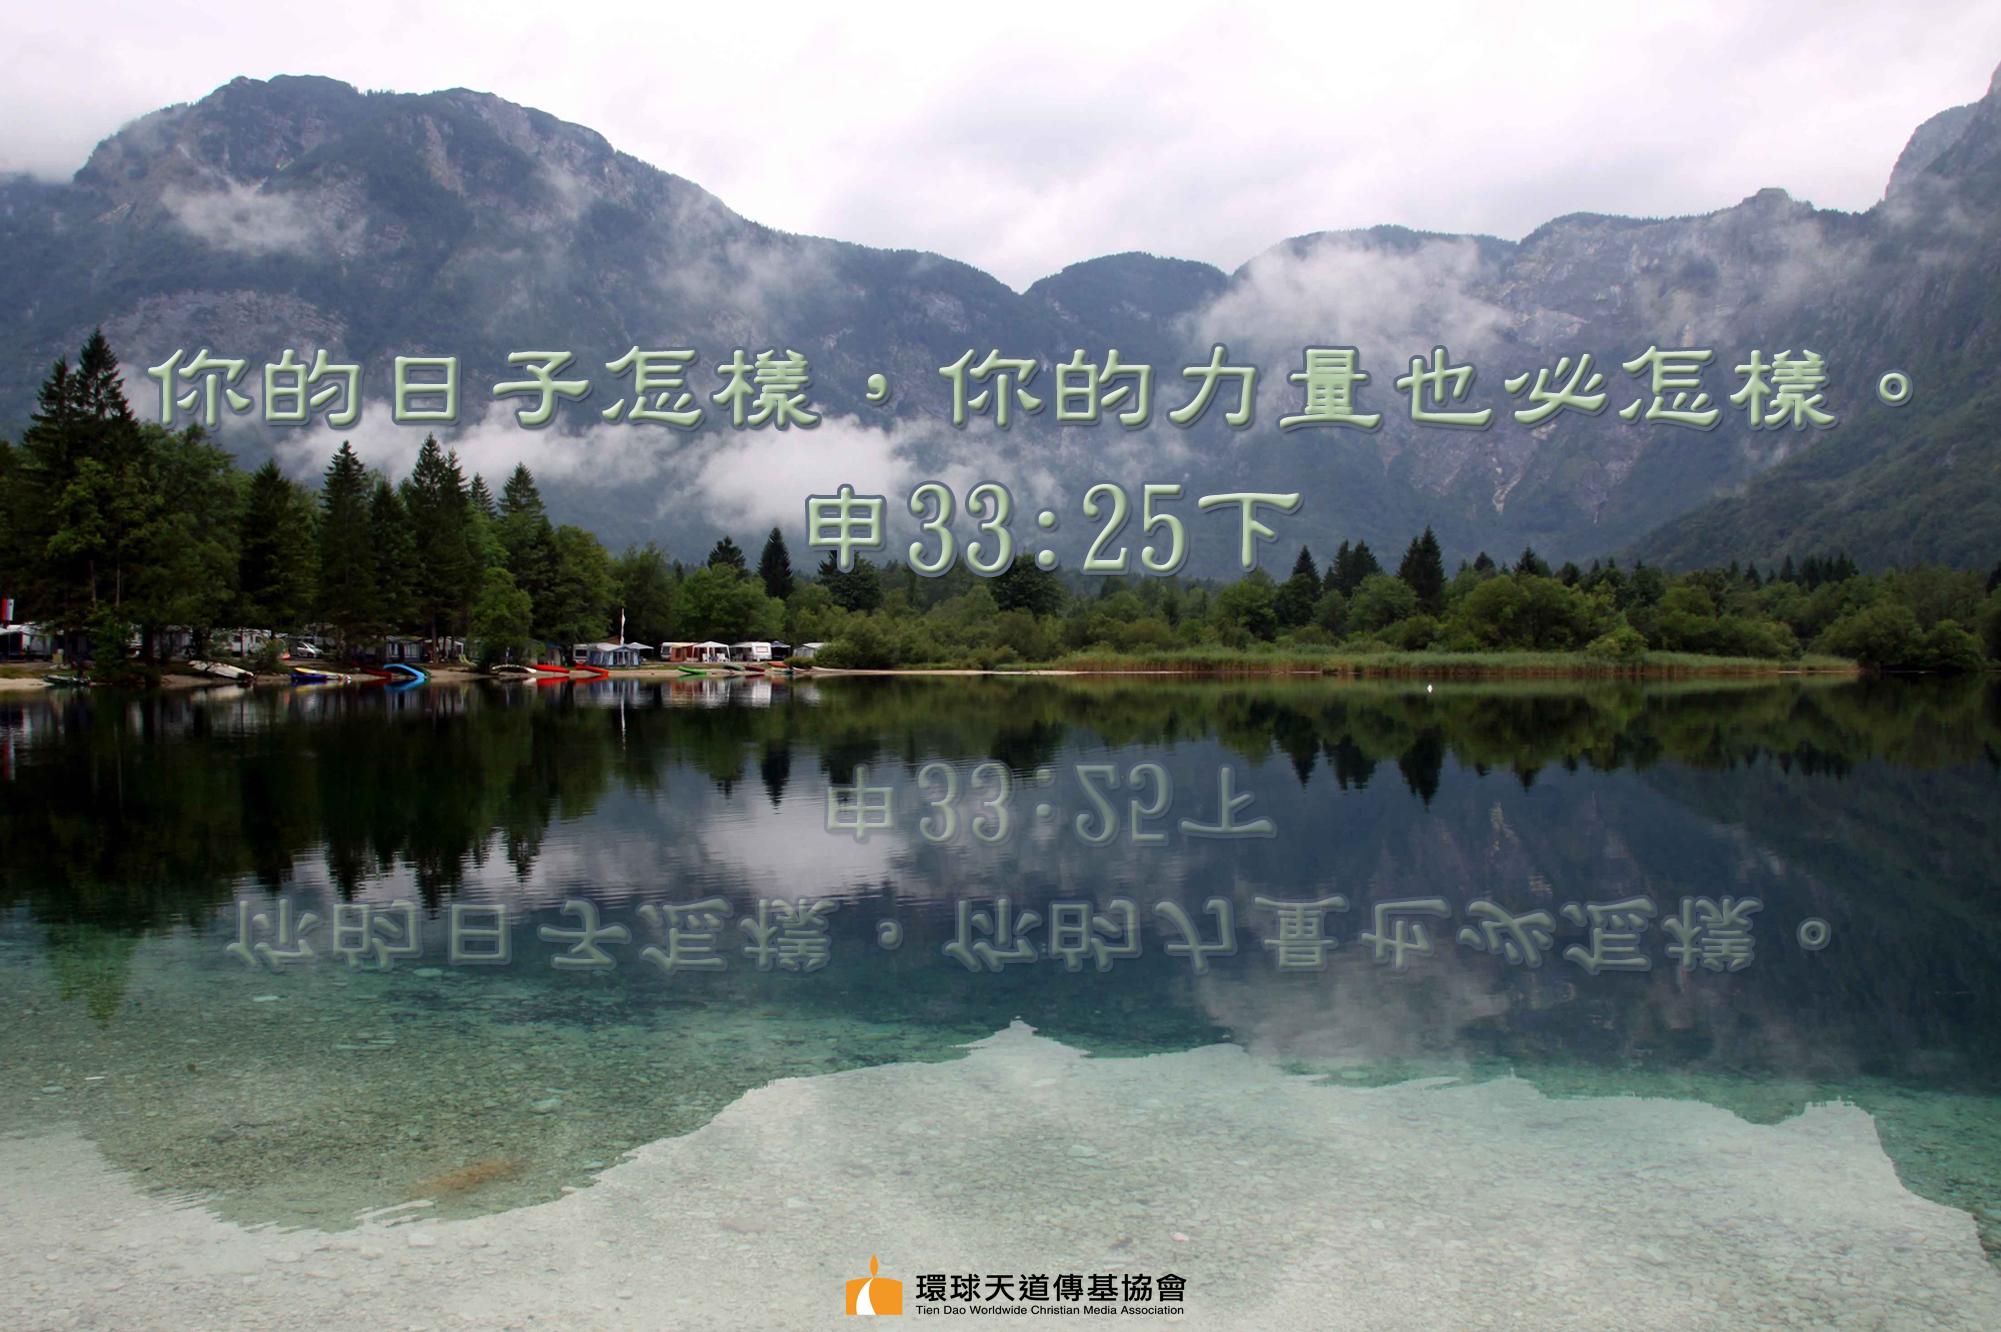 2020.5.6 jade reflection 2